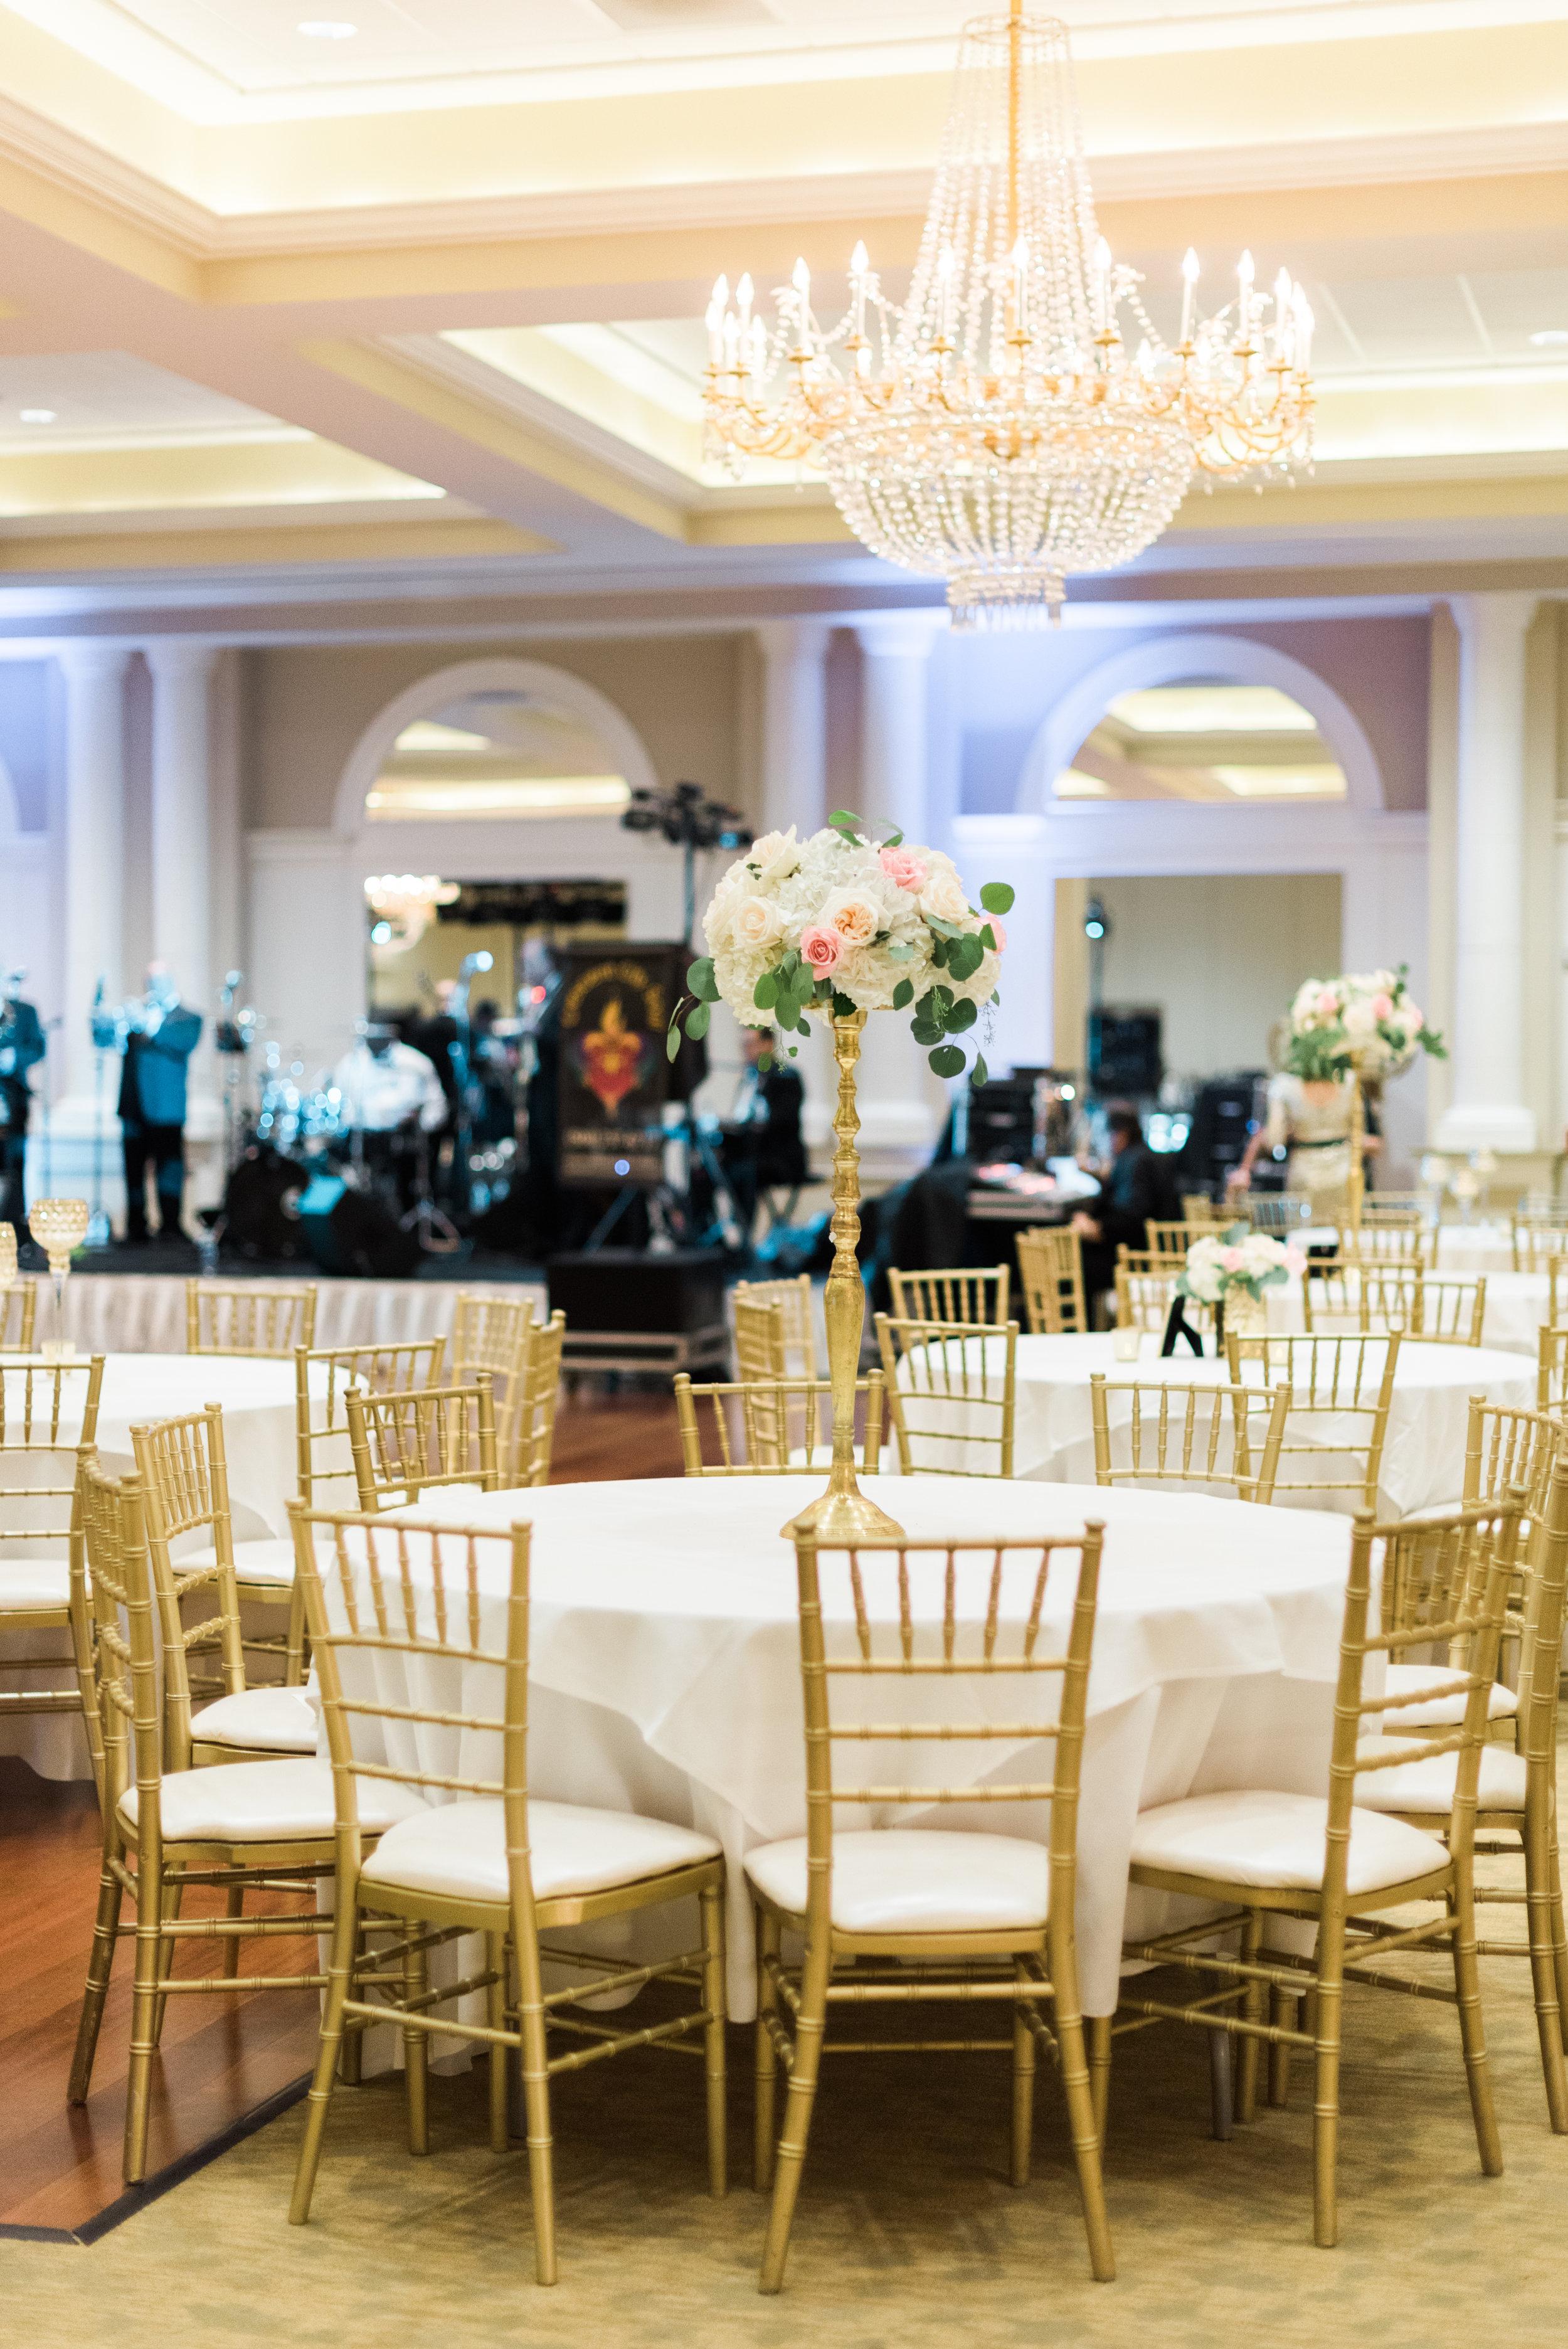 Southern Fete, Southern Wedding, Le Pavillon, Crescent City Soul, Sarah Beth Photography, Reception